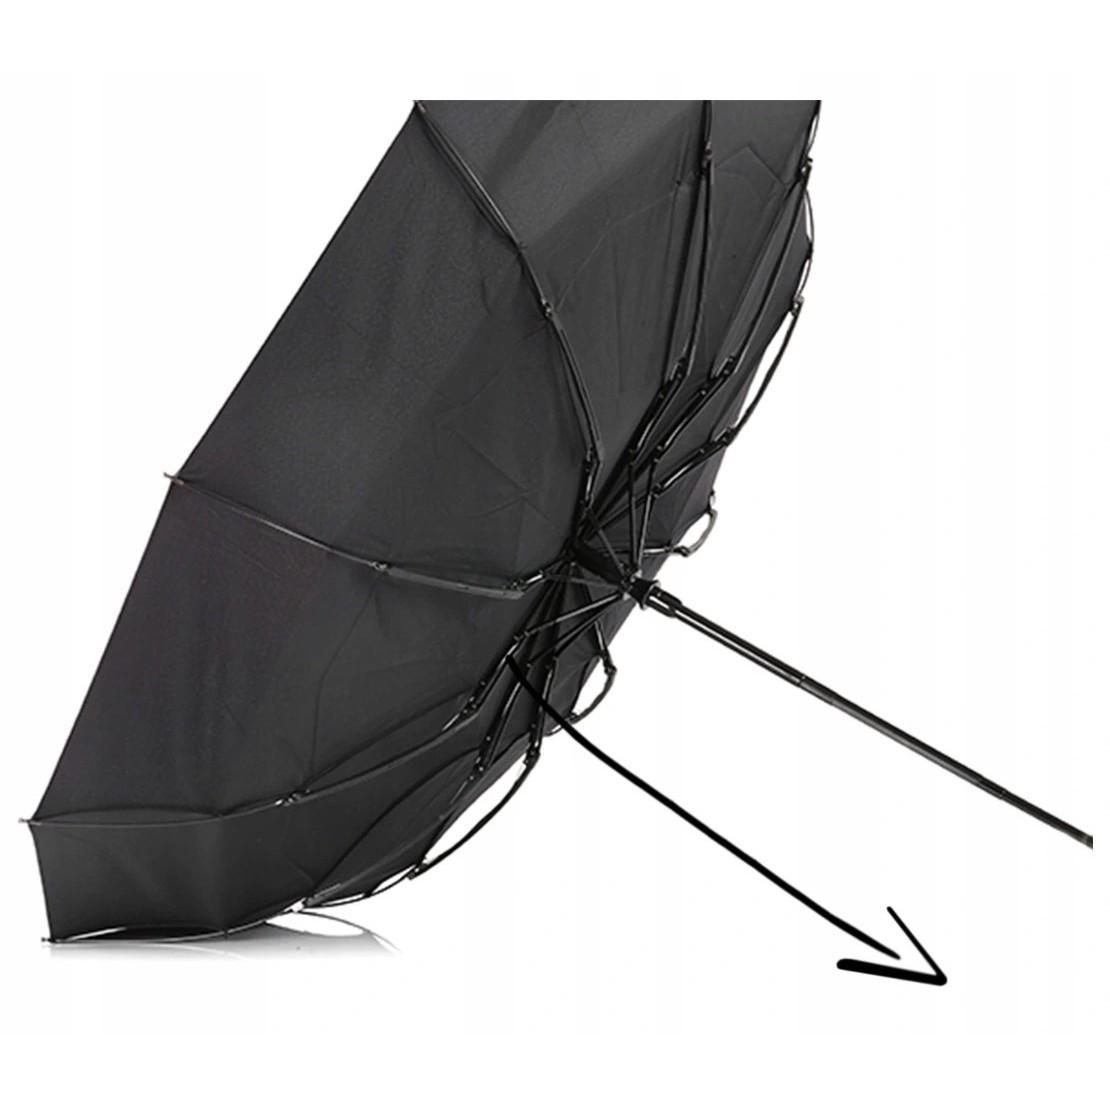 dáždnik skladací automatický kvalitný megamix.sk